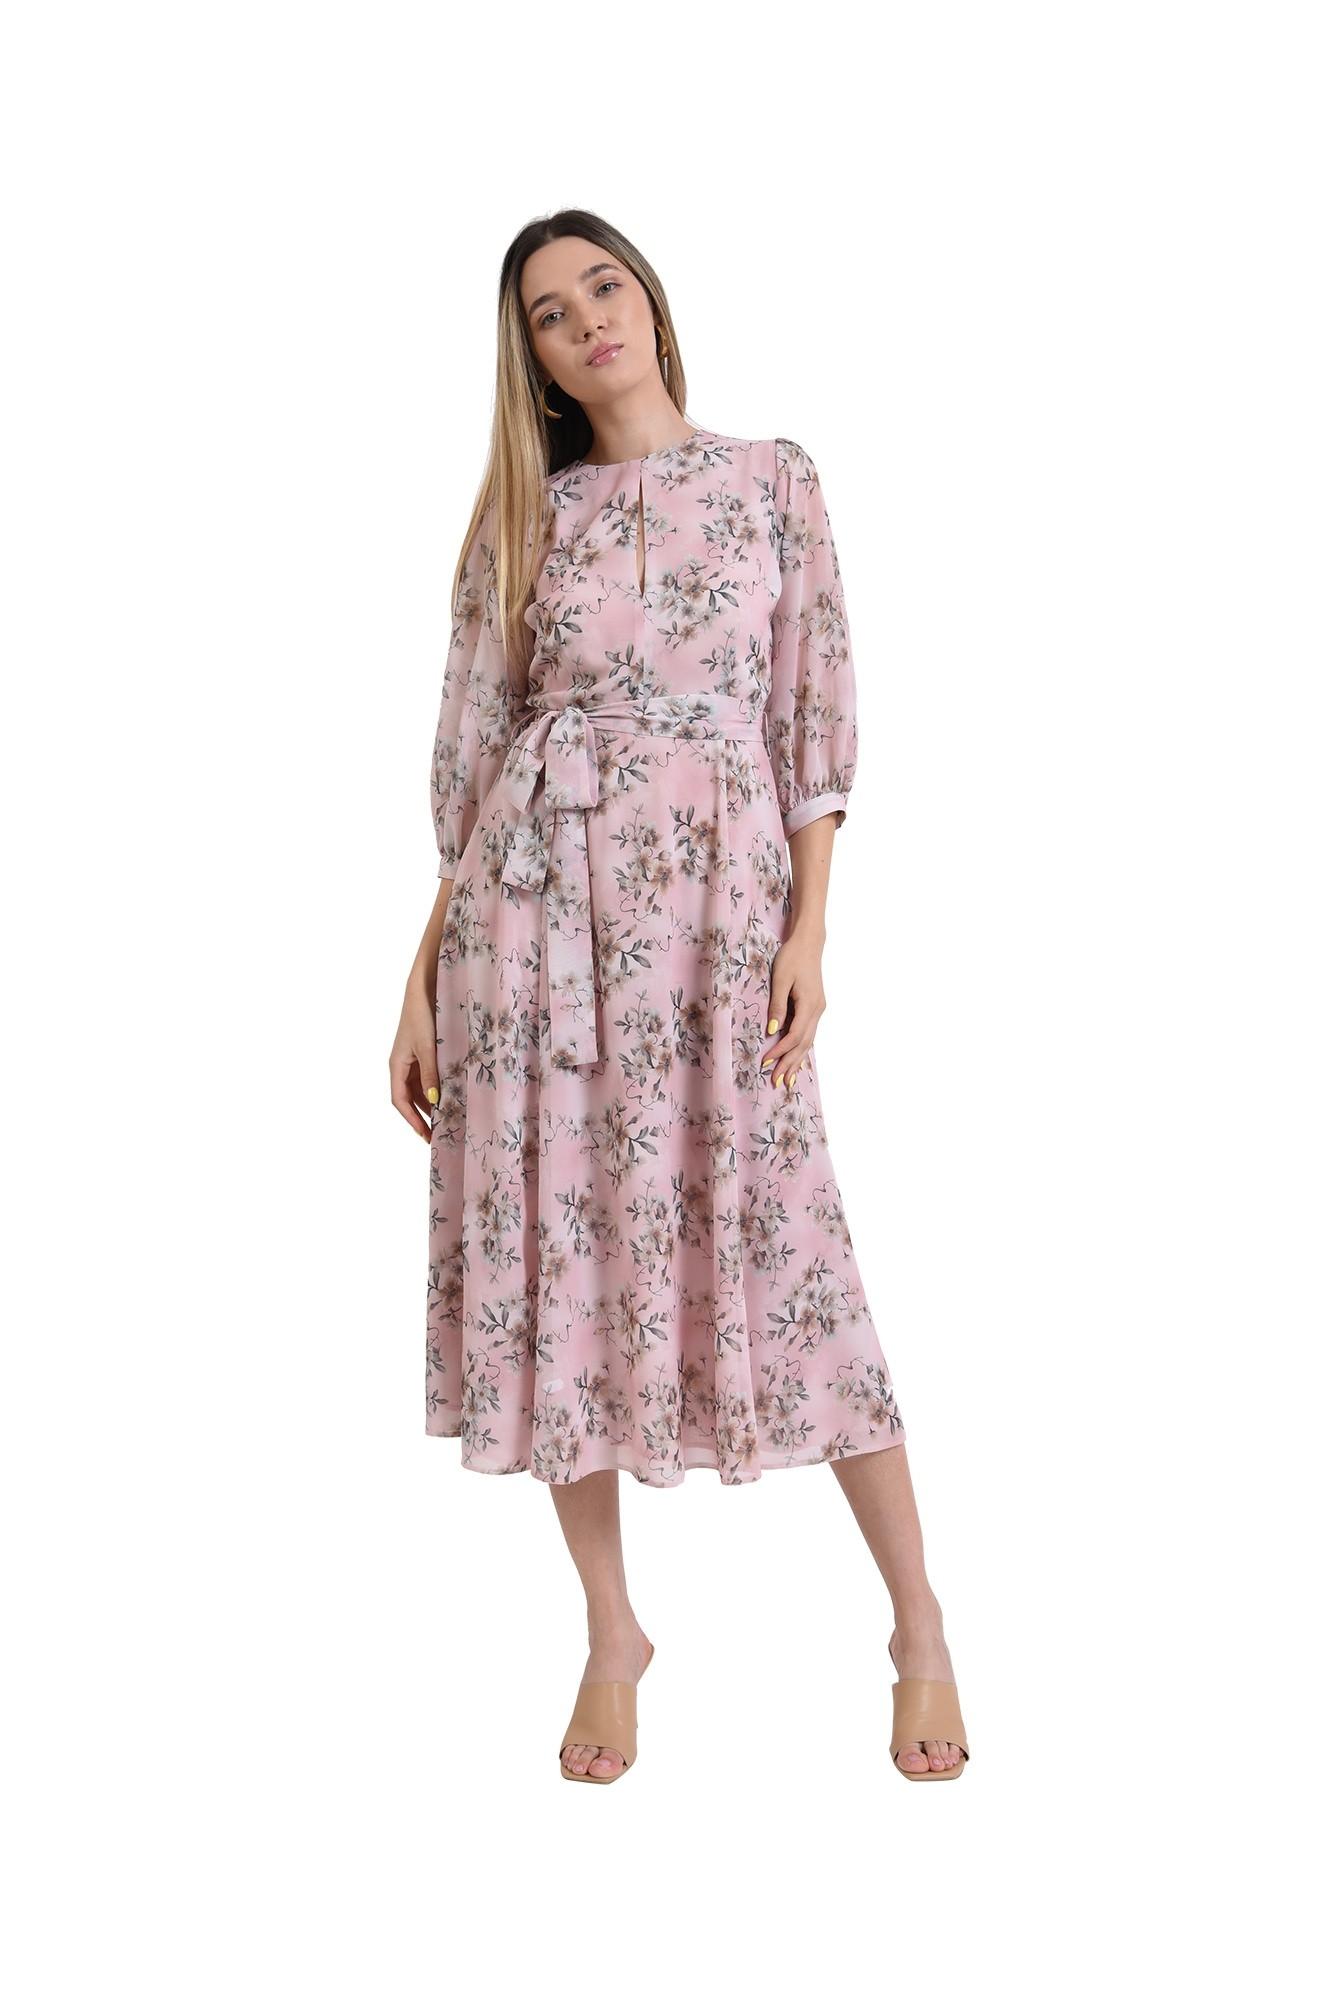 3 - rochie midi, evazata, roz, florala, eleganta